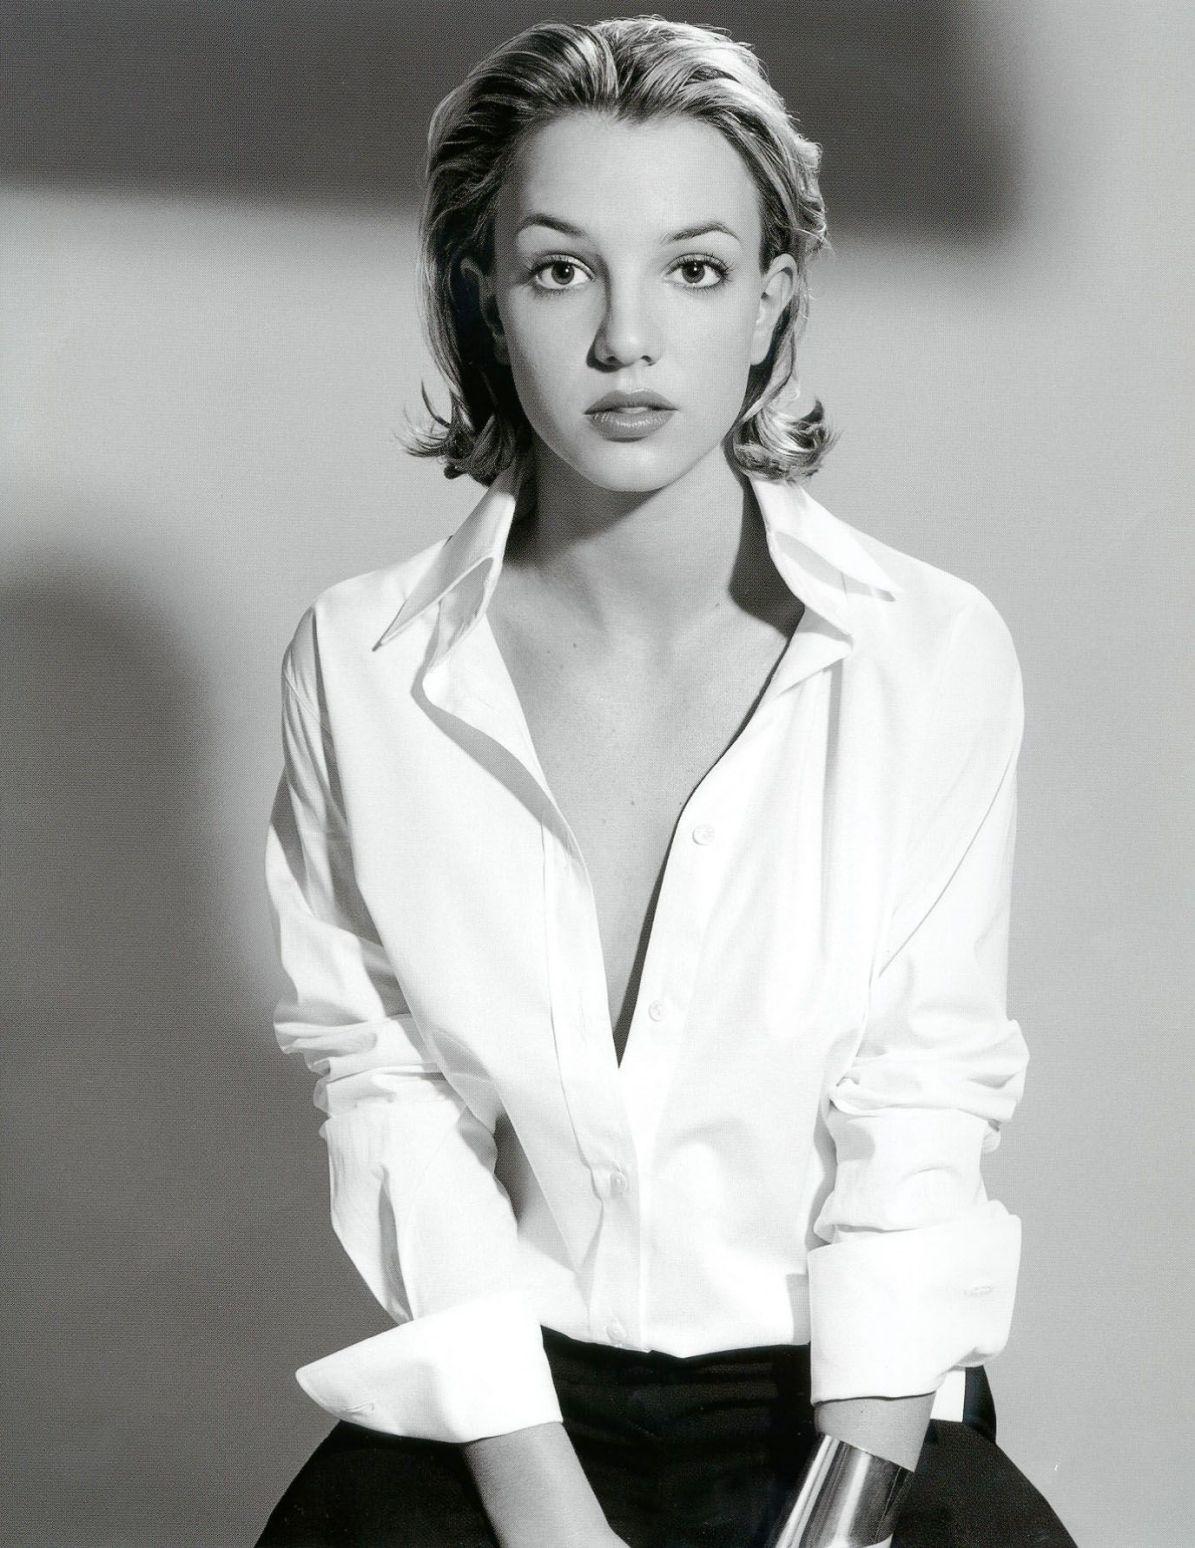 48548_Britney_Spears_-_White_shirt_-_BW_-_001-Sclp_122_519lo.Jpg